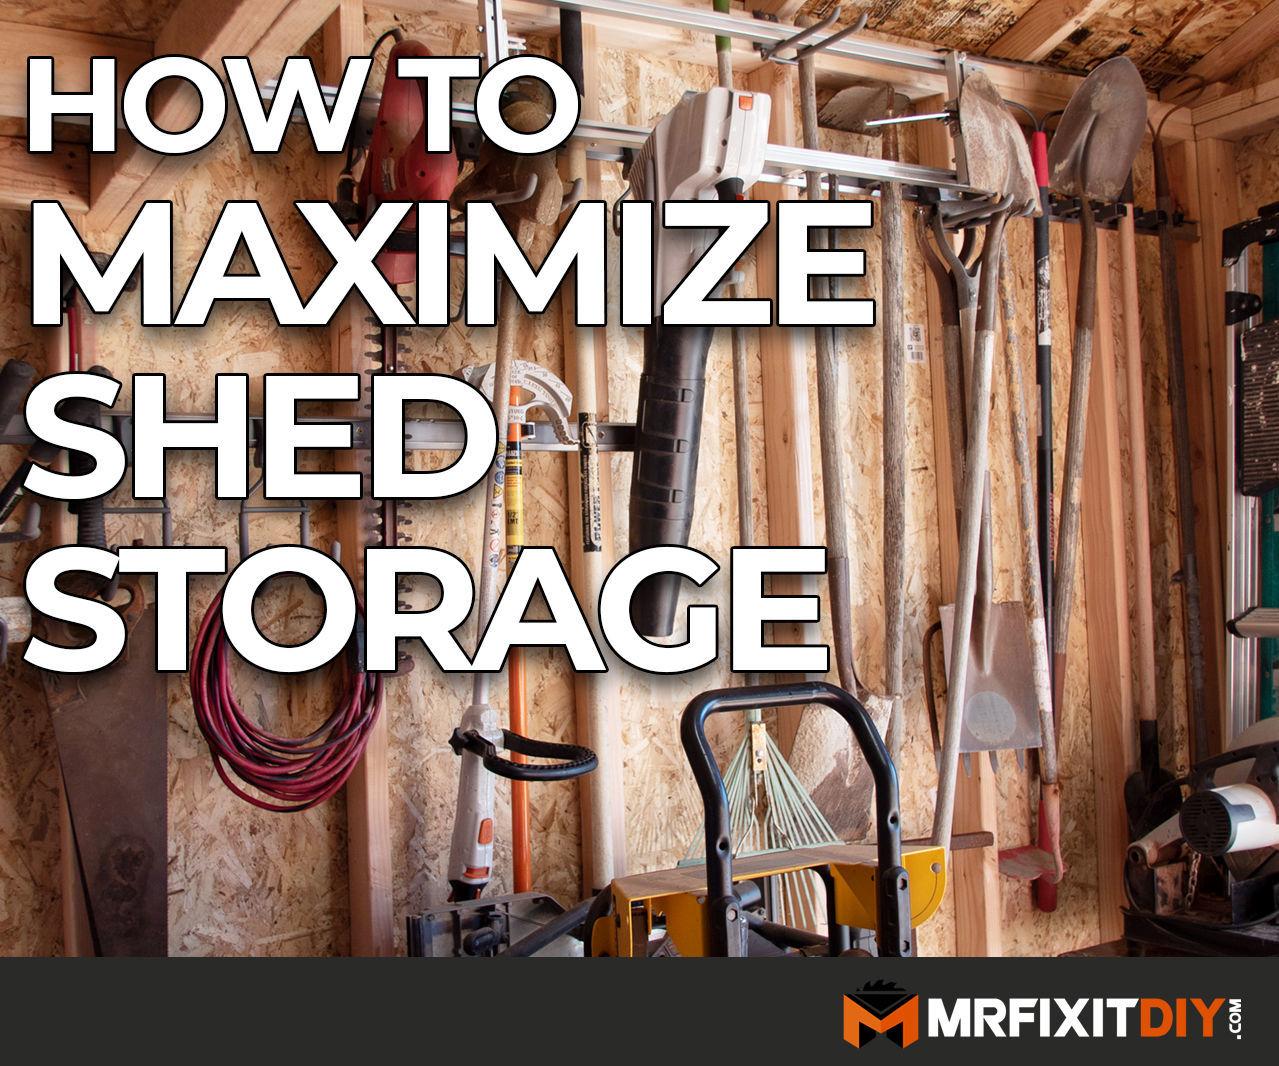 5 Ways to Maximize Shed Storage